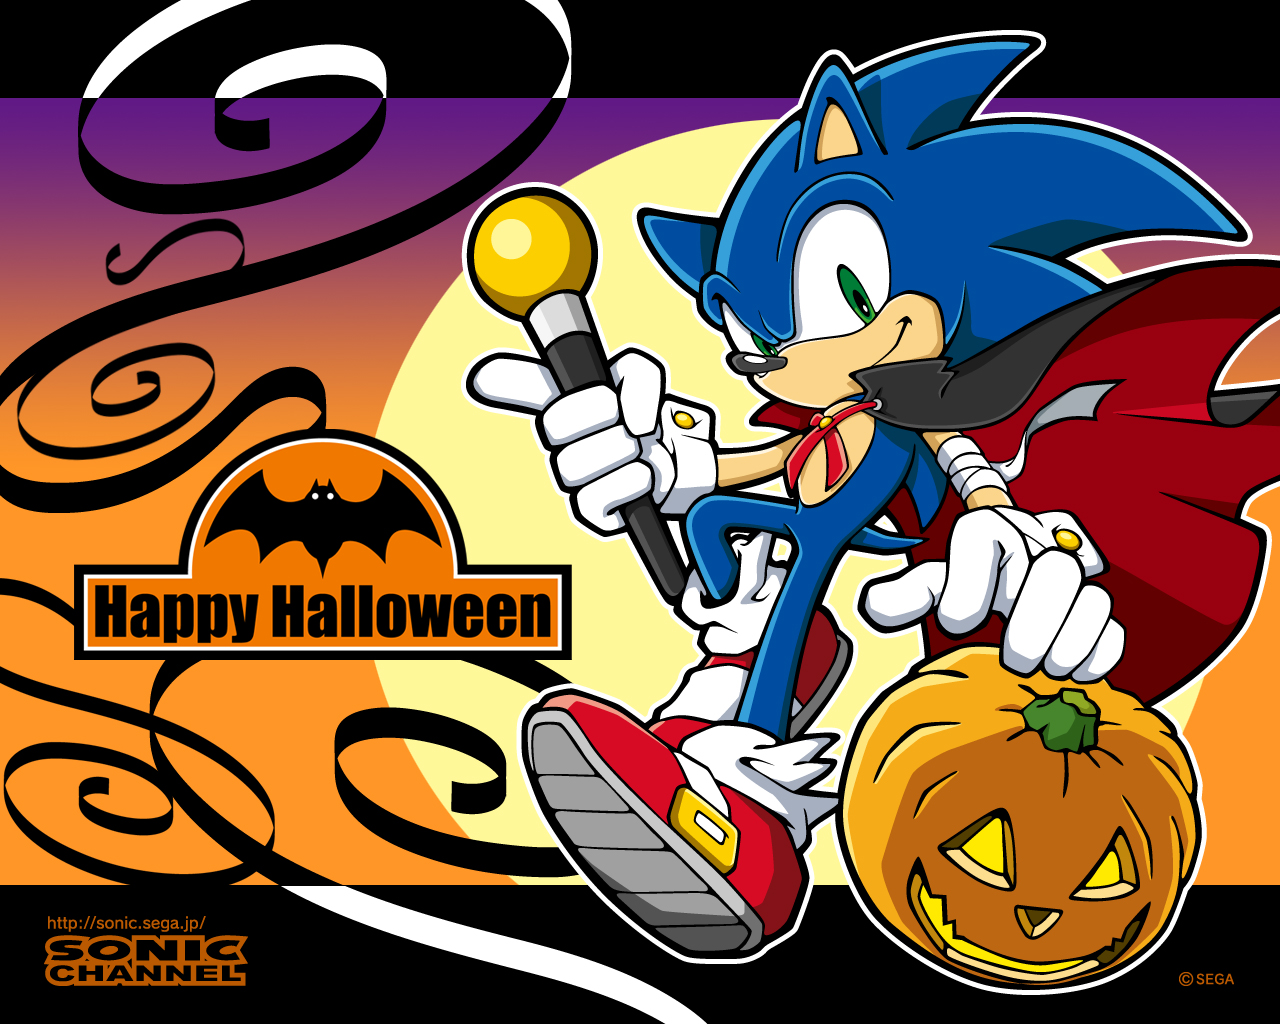 Sonic The Hedgehog Happy Halloween Hedgehog Halloween Sonic